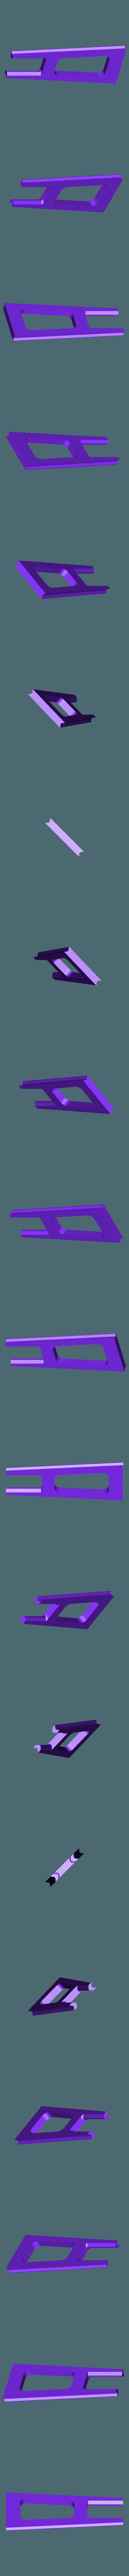 Rear_Keel_Tool.stl Download free STL file Flyer Mk. 1 • 3D printing object, billbo1958